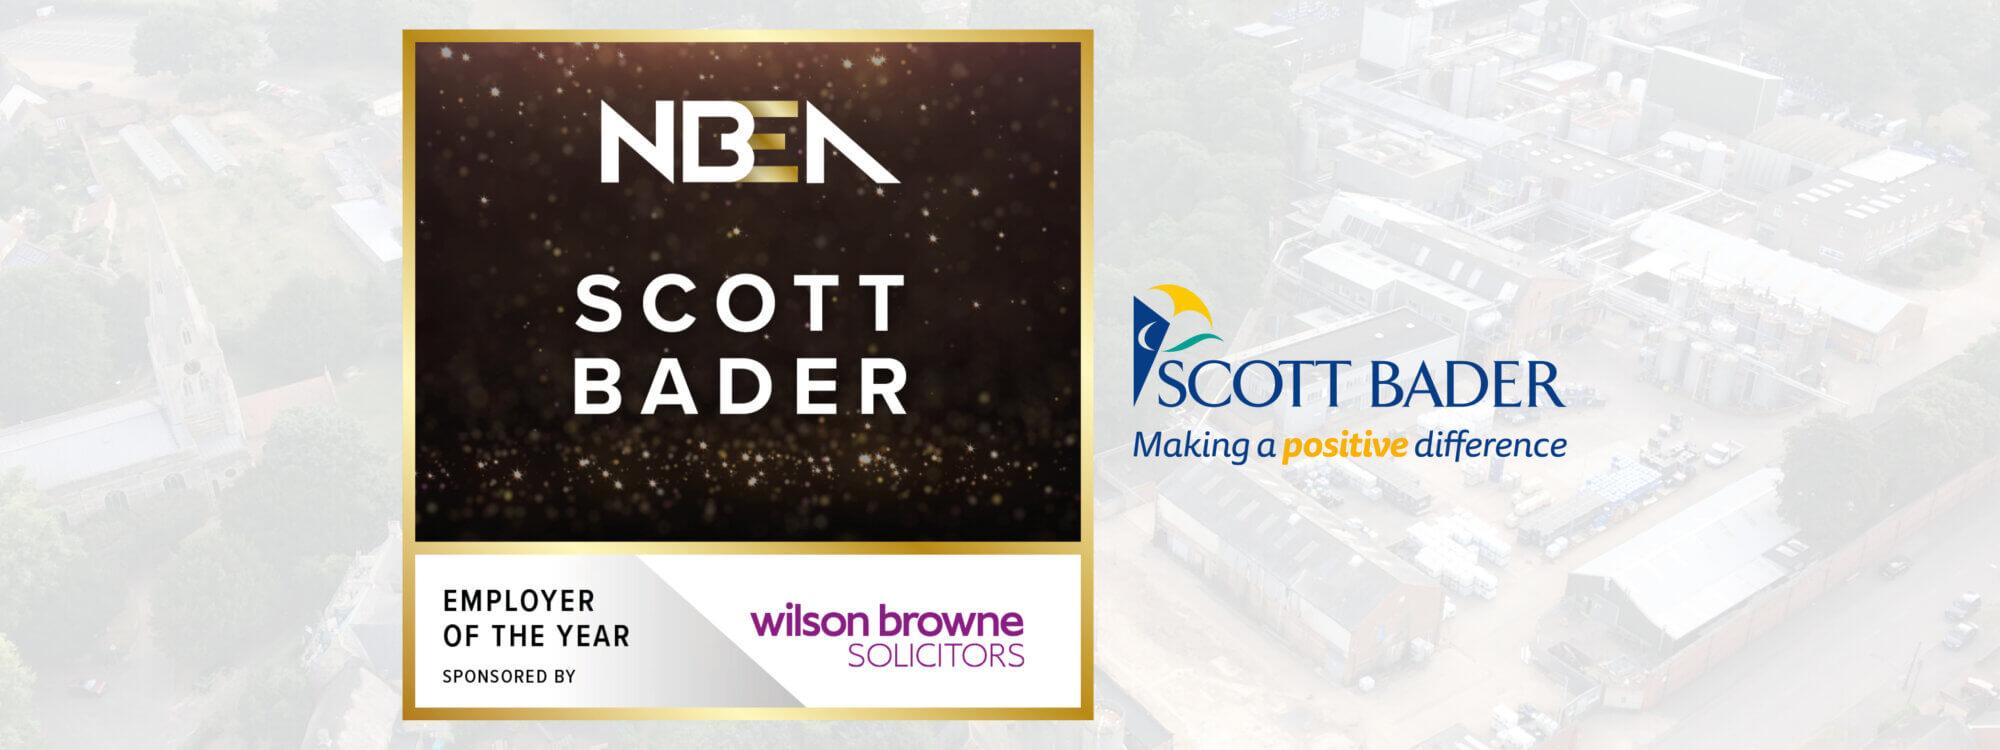 Scott Bader UK wins Employer of the Year award for Northamptonshire